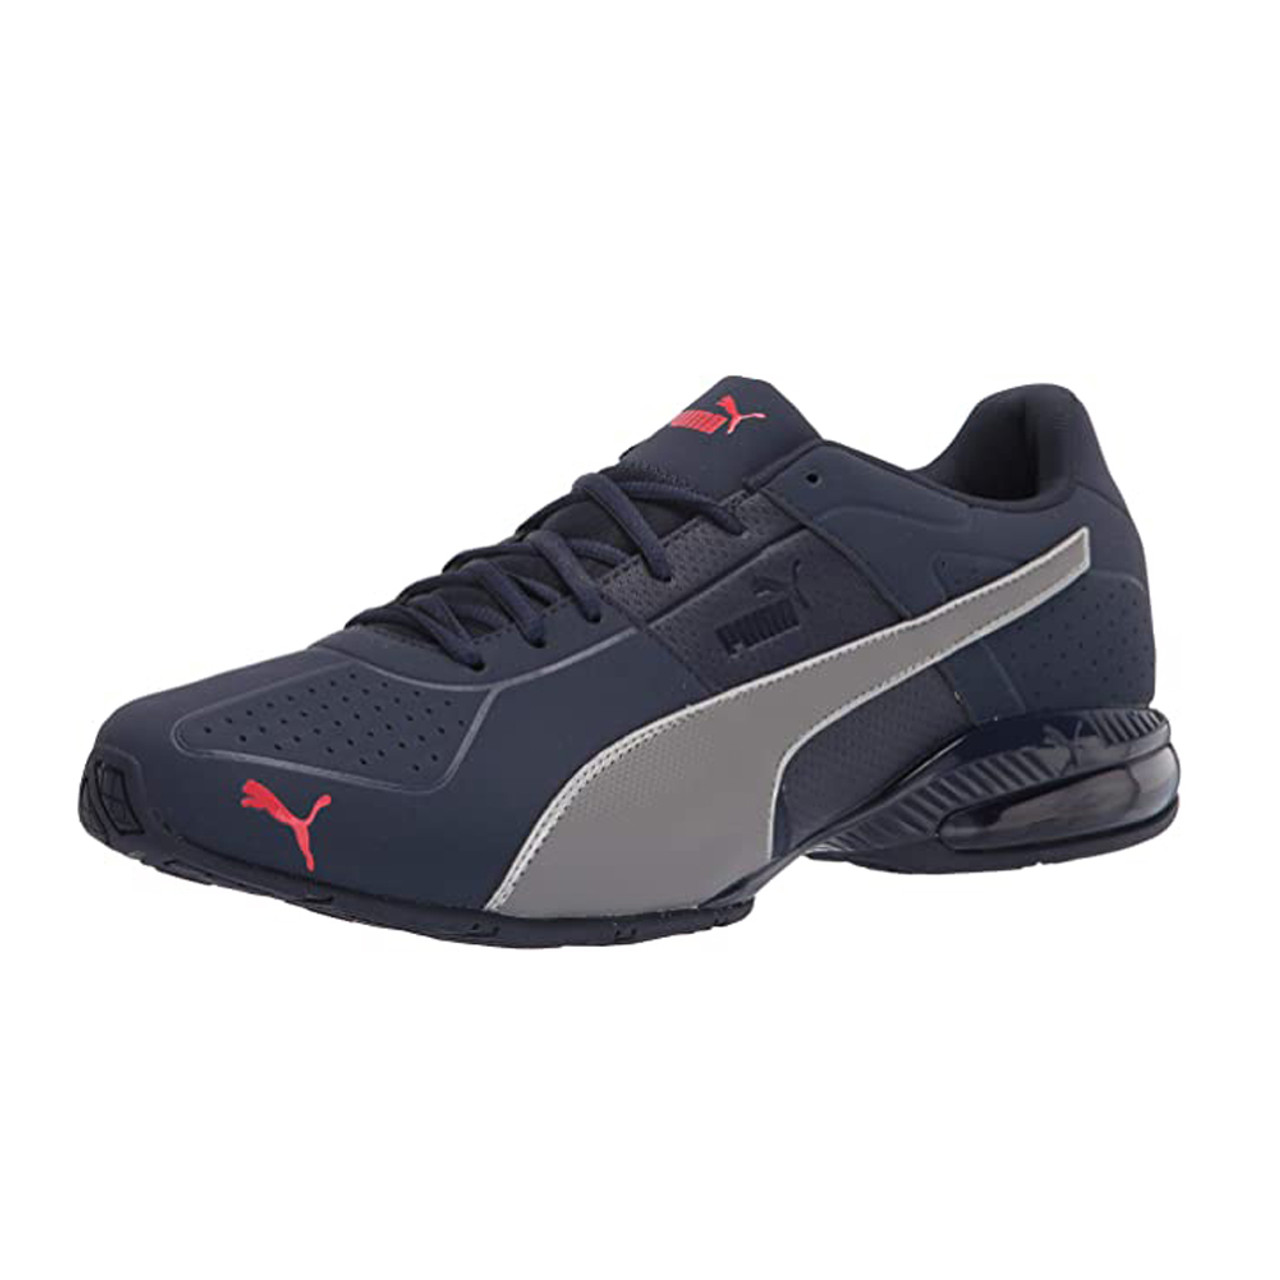 Puma Men's CELL Surin 2 Matte Training Shoe Peacoat/Castlerock/Red